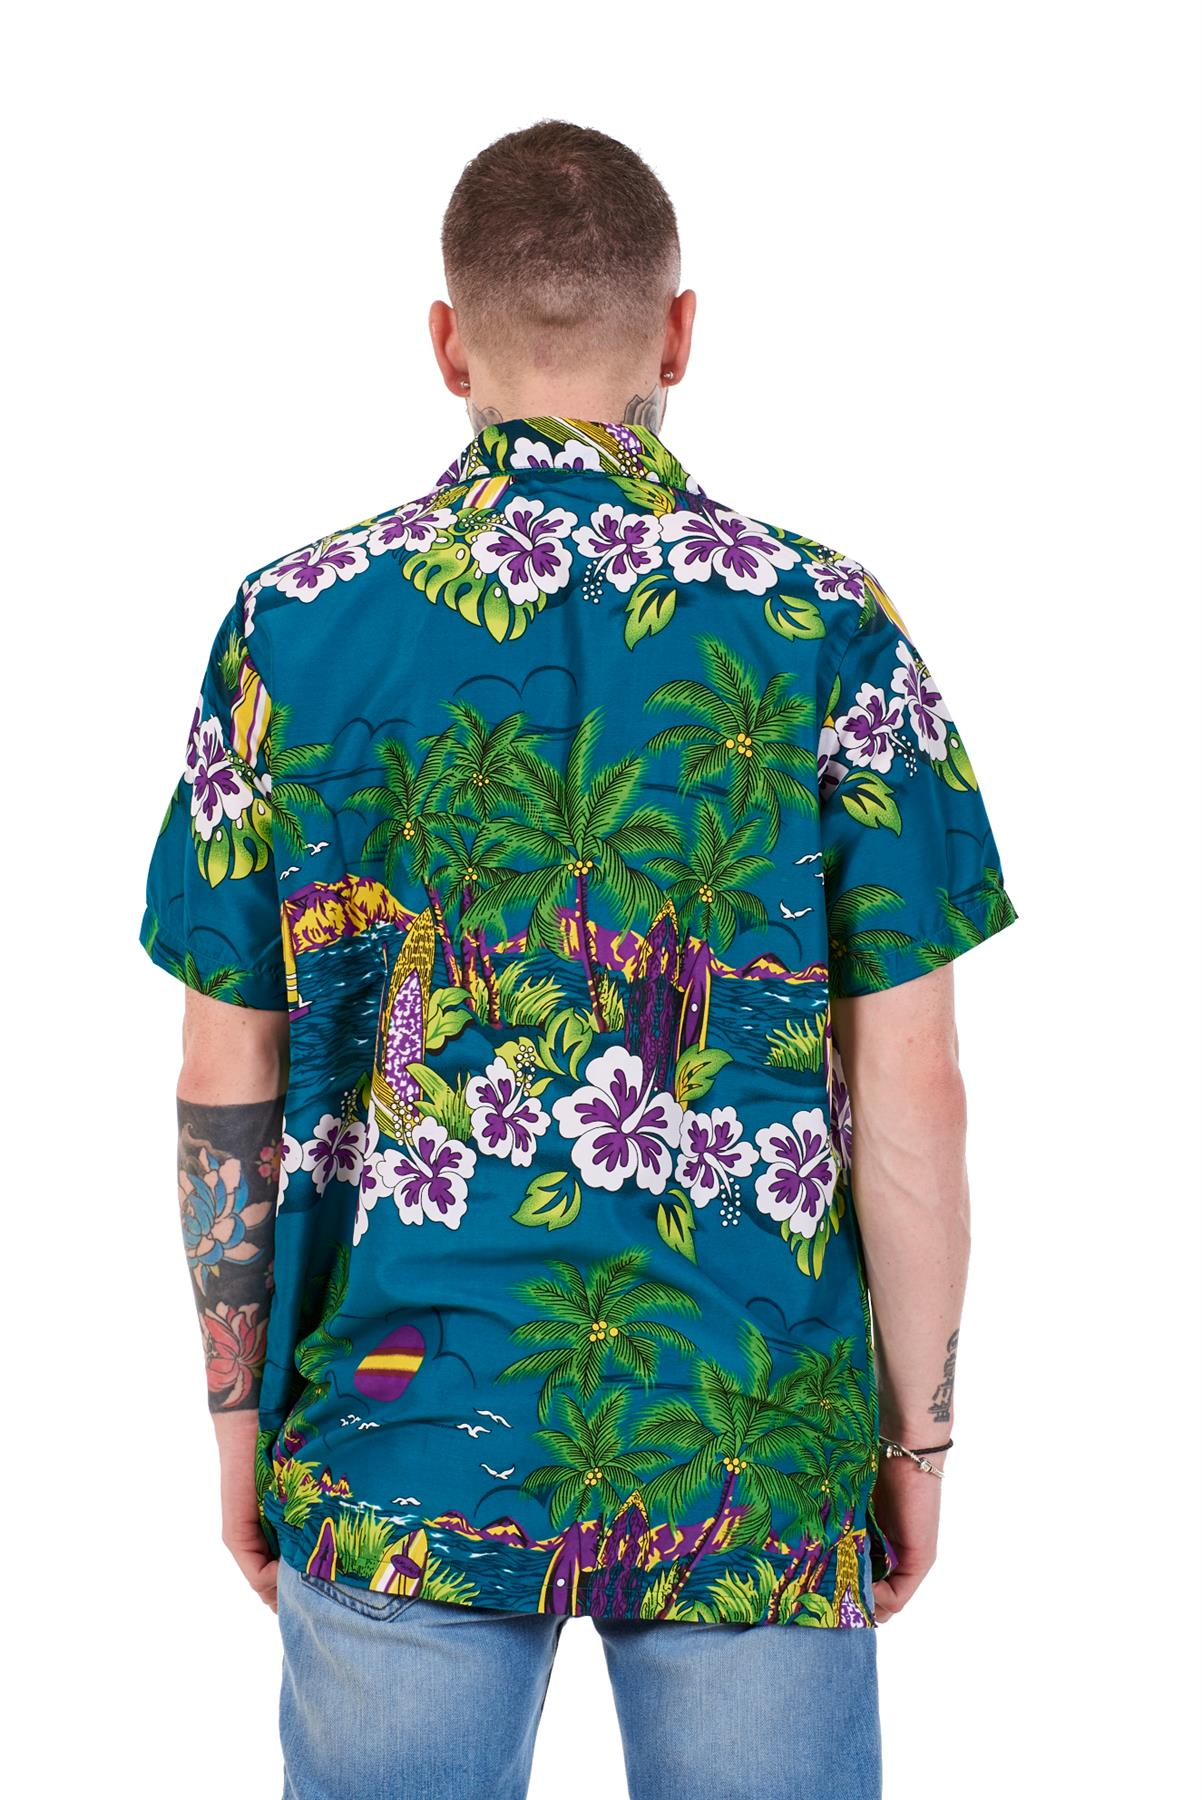 Mens-Hawaiian-Shirt-Multi-Colors-Print-Regular-Big-Size-Summer-Fancy-Dress-M-5XL thumbnail 10